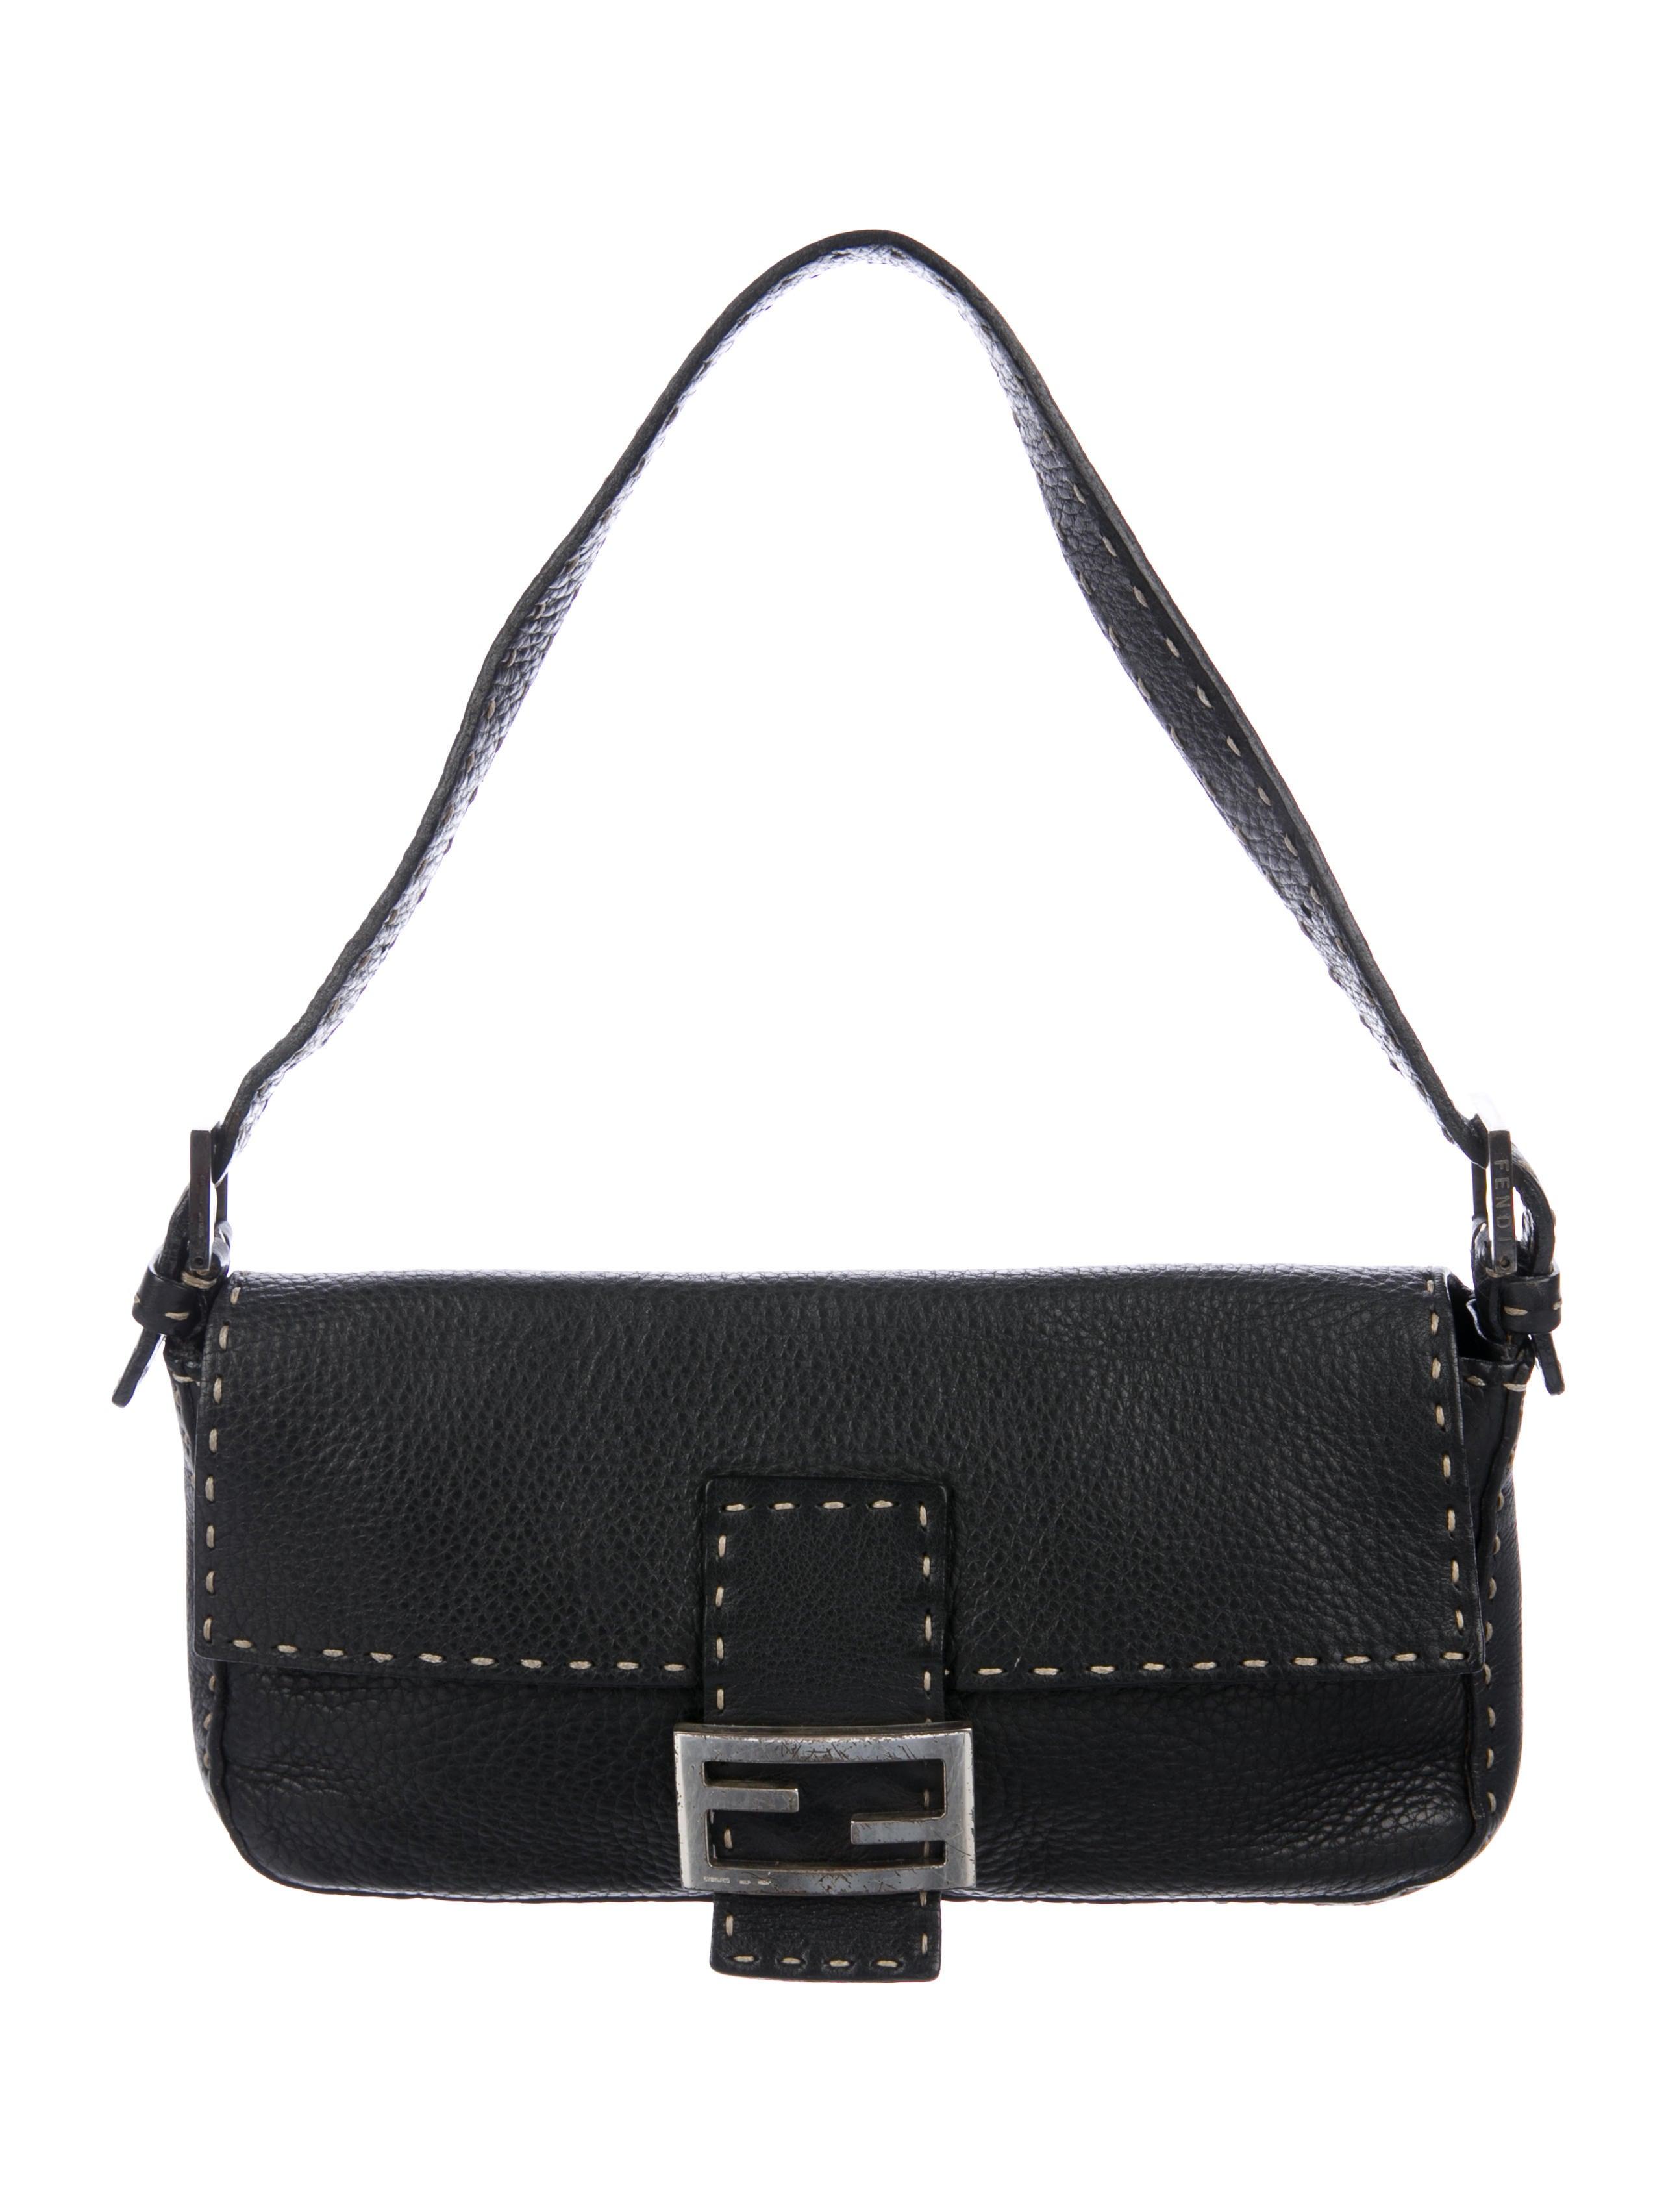 Bag Fendi Fendi Baguette Selleria Baguette Bag Fendi Selleria Pq6WBw ... e36c35aac3e52